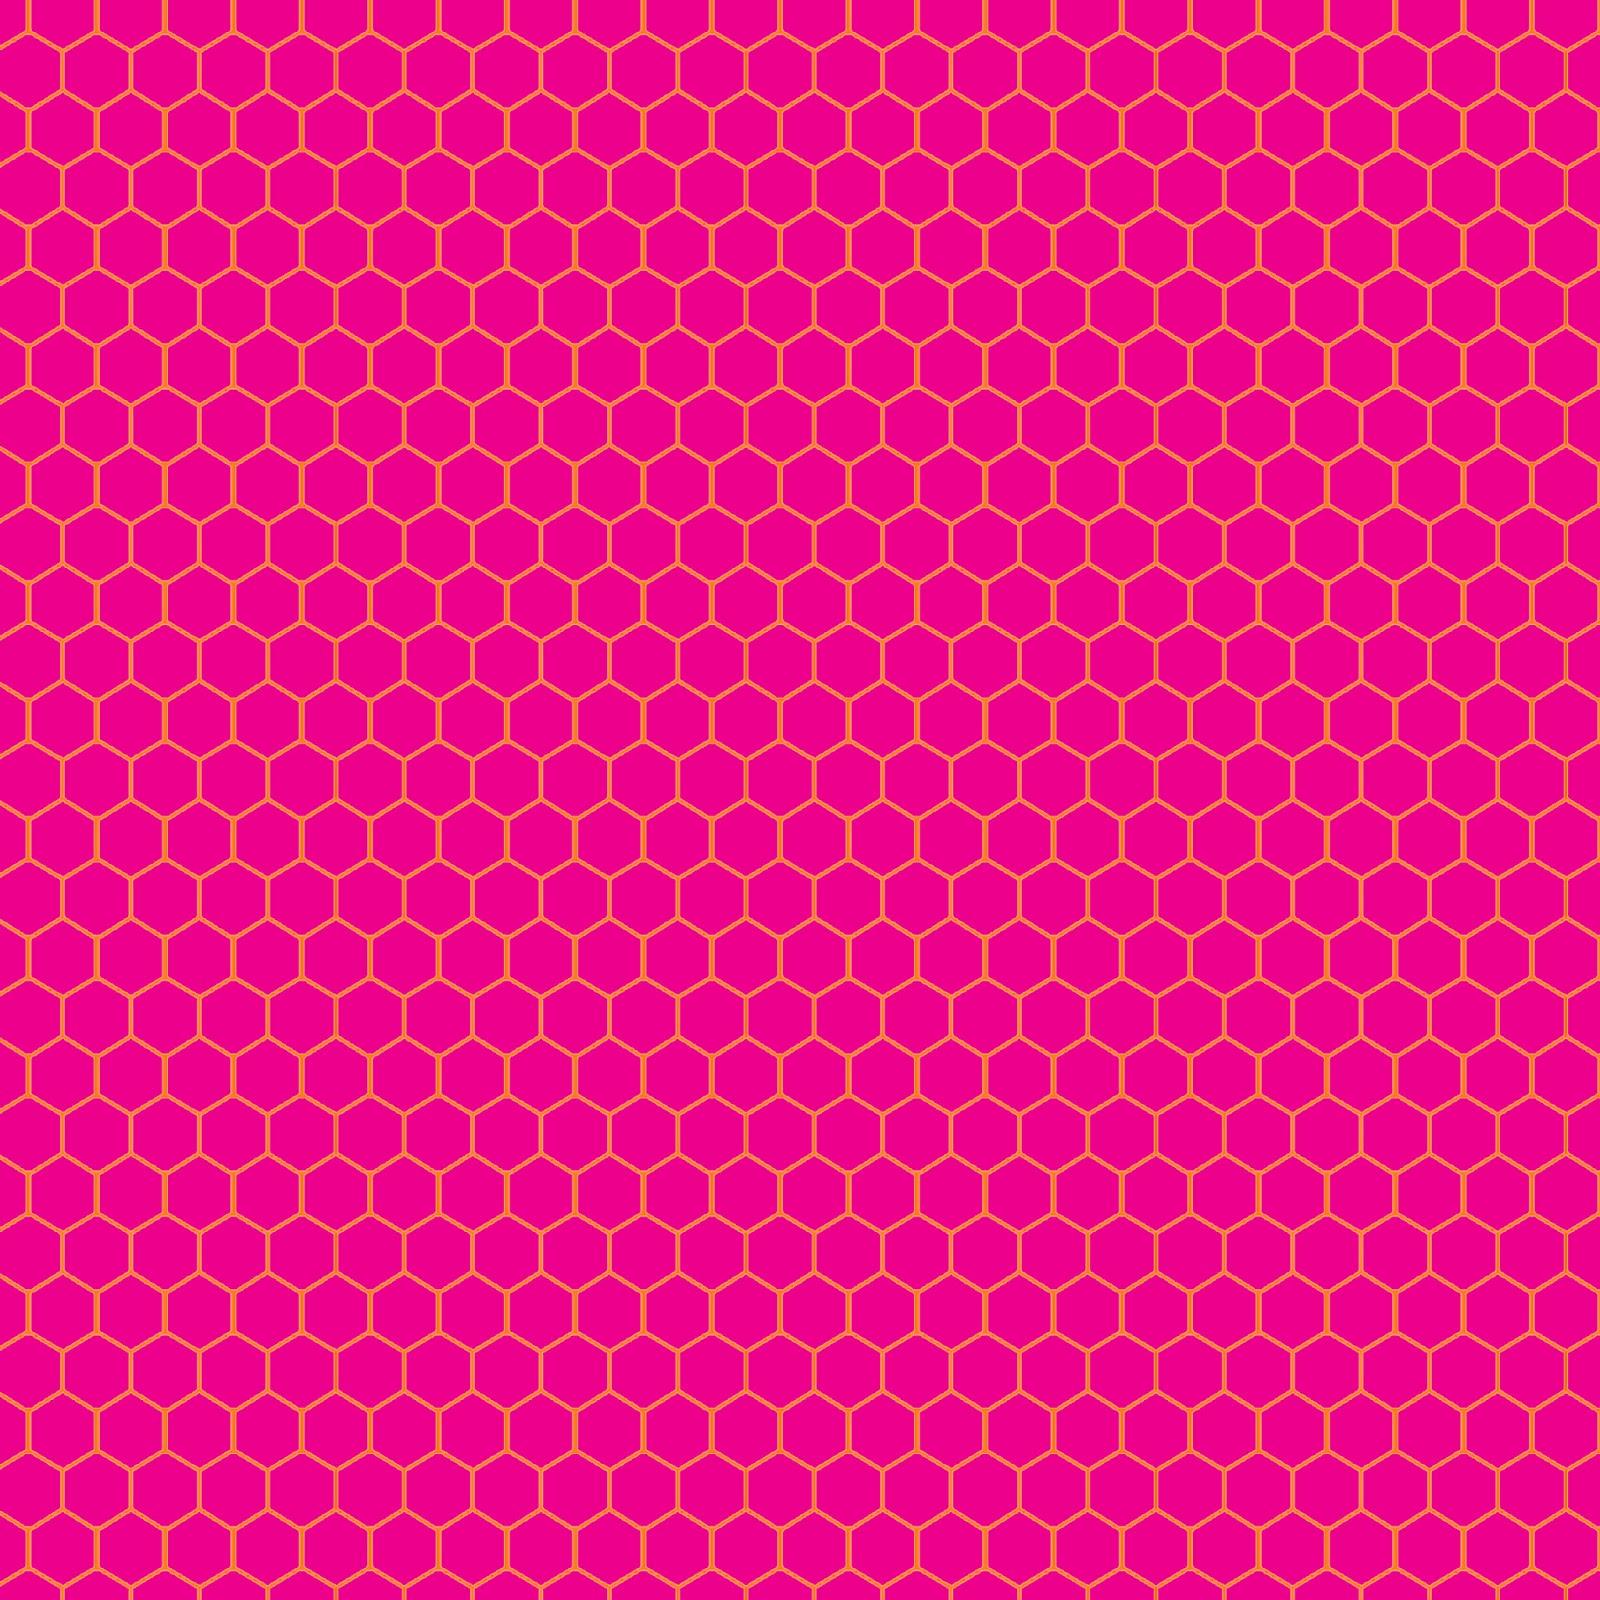 Doodlecraft Hexagon Honeycomb FREEBIE Background Pattern